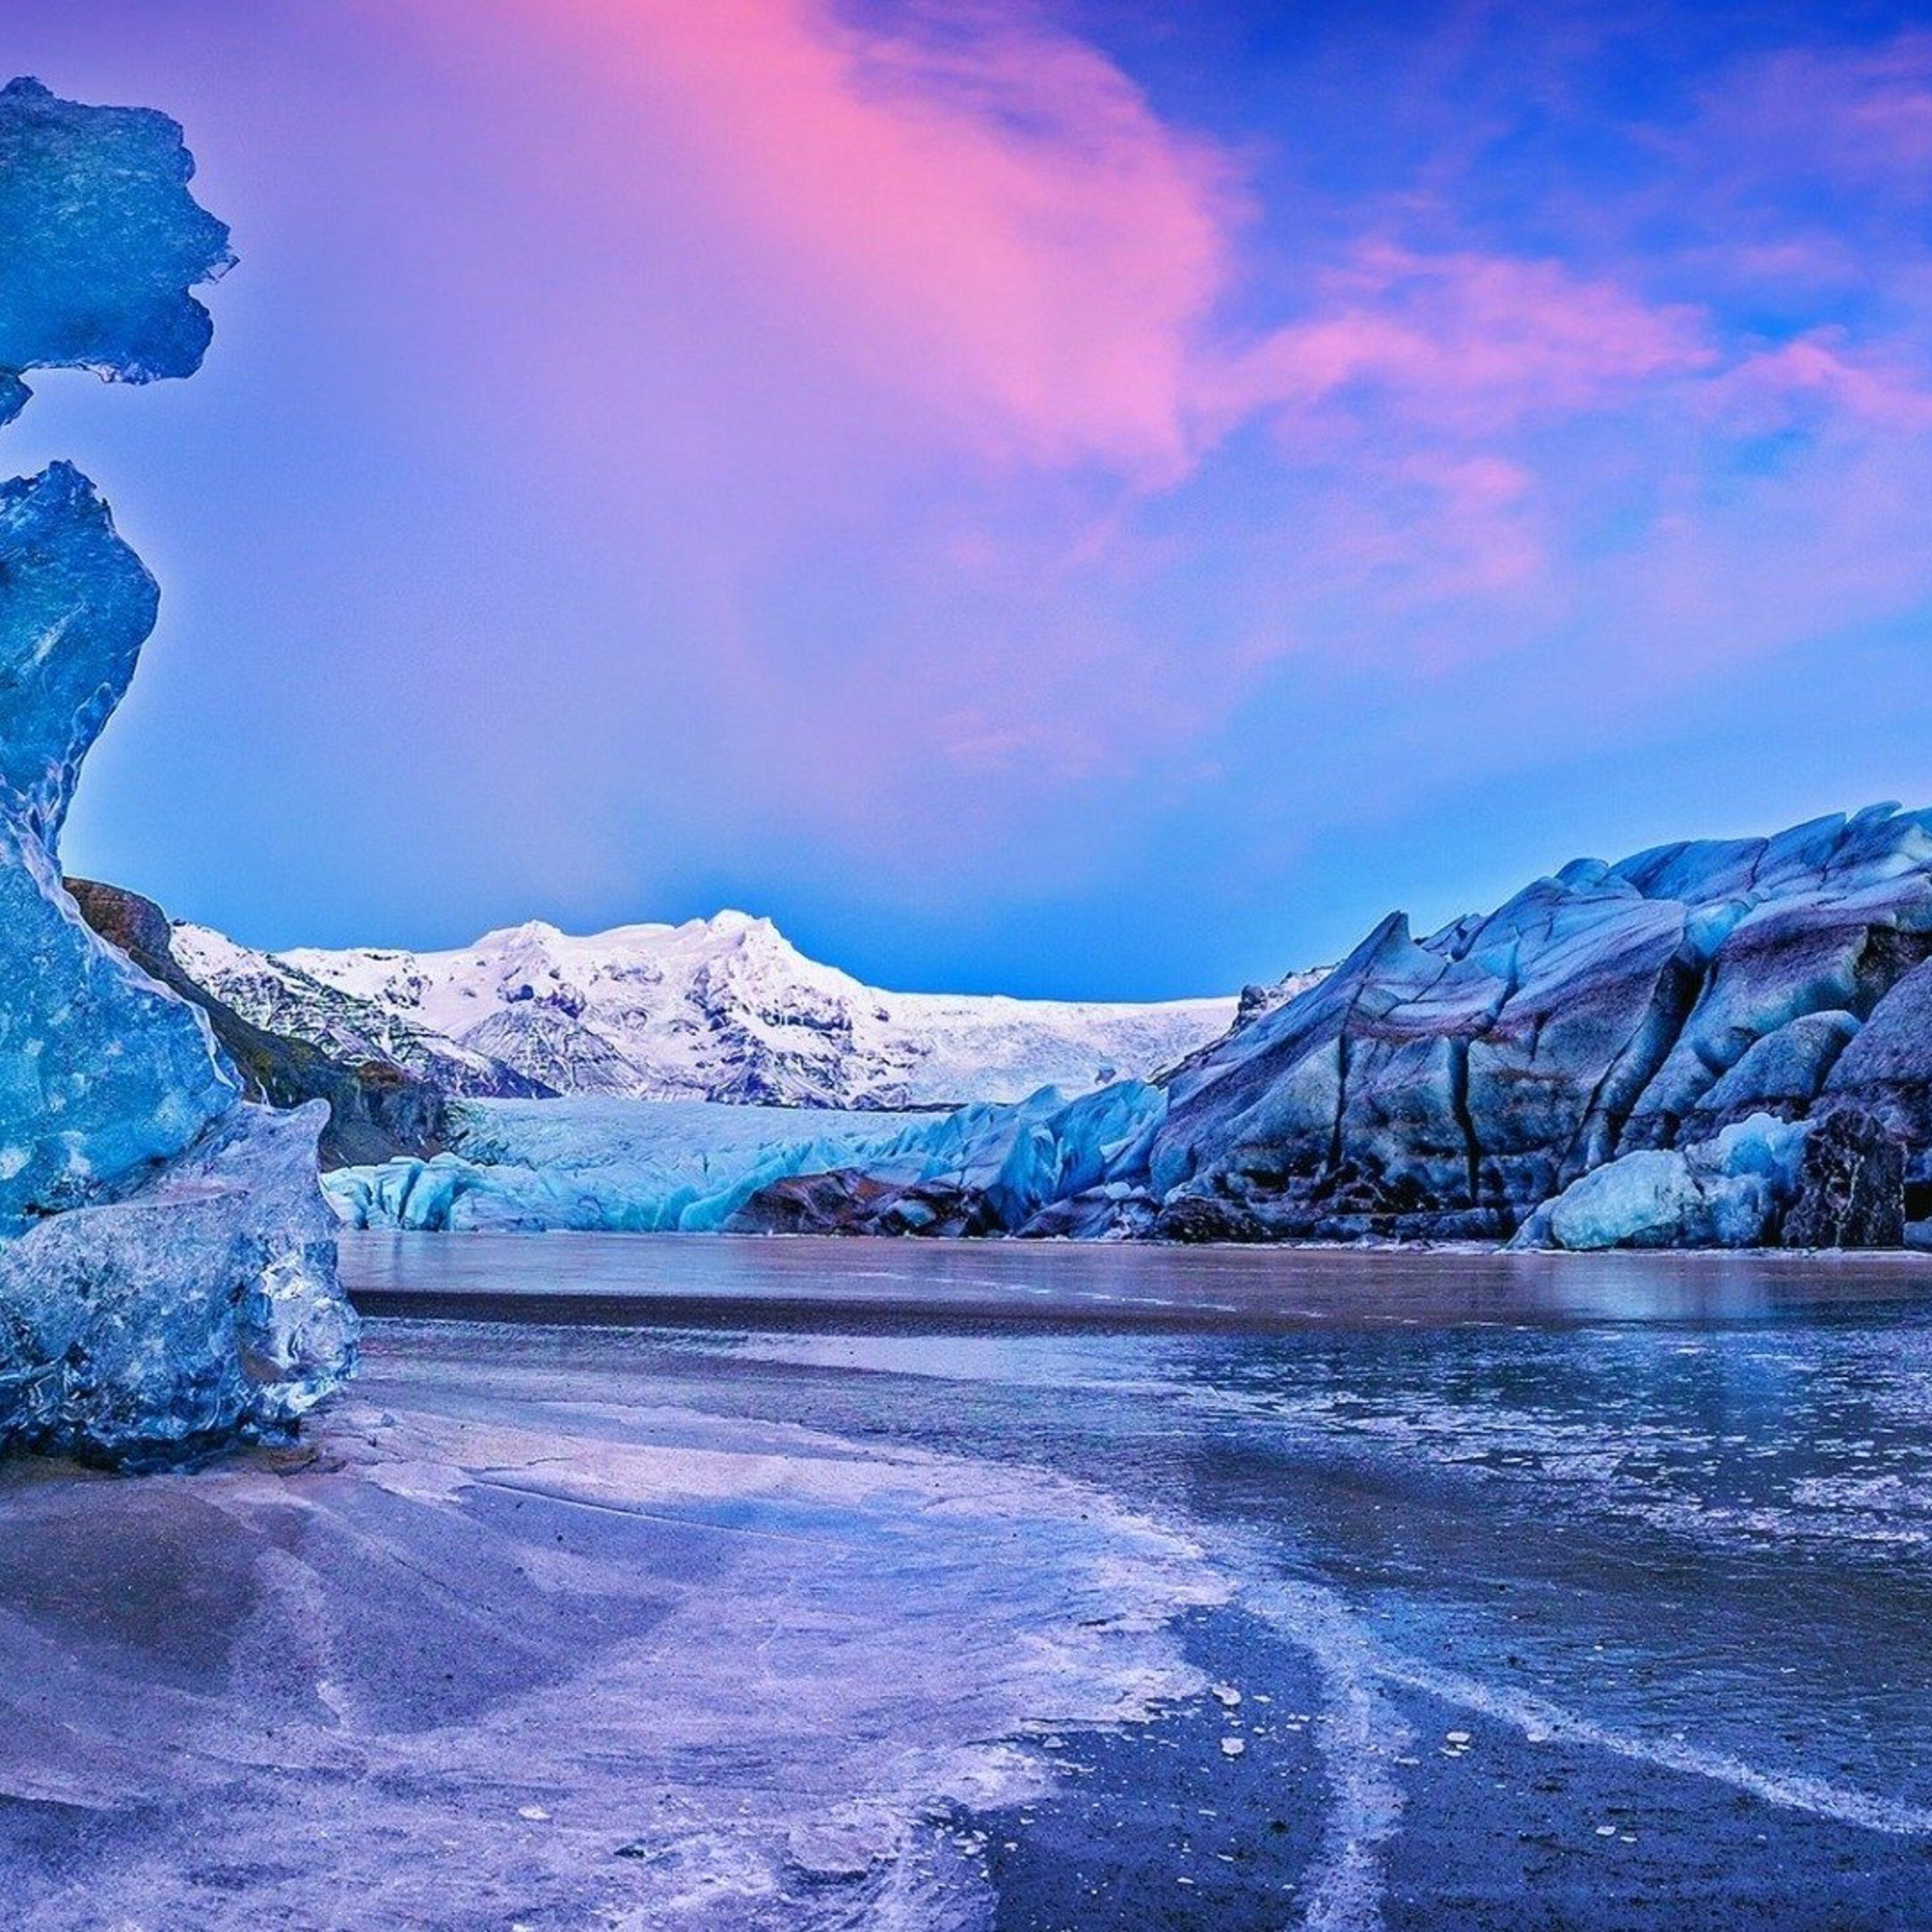 2932x2932 Vatna Glacier Ipad Pro Retina Display HD 4k